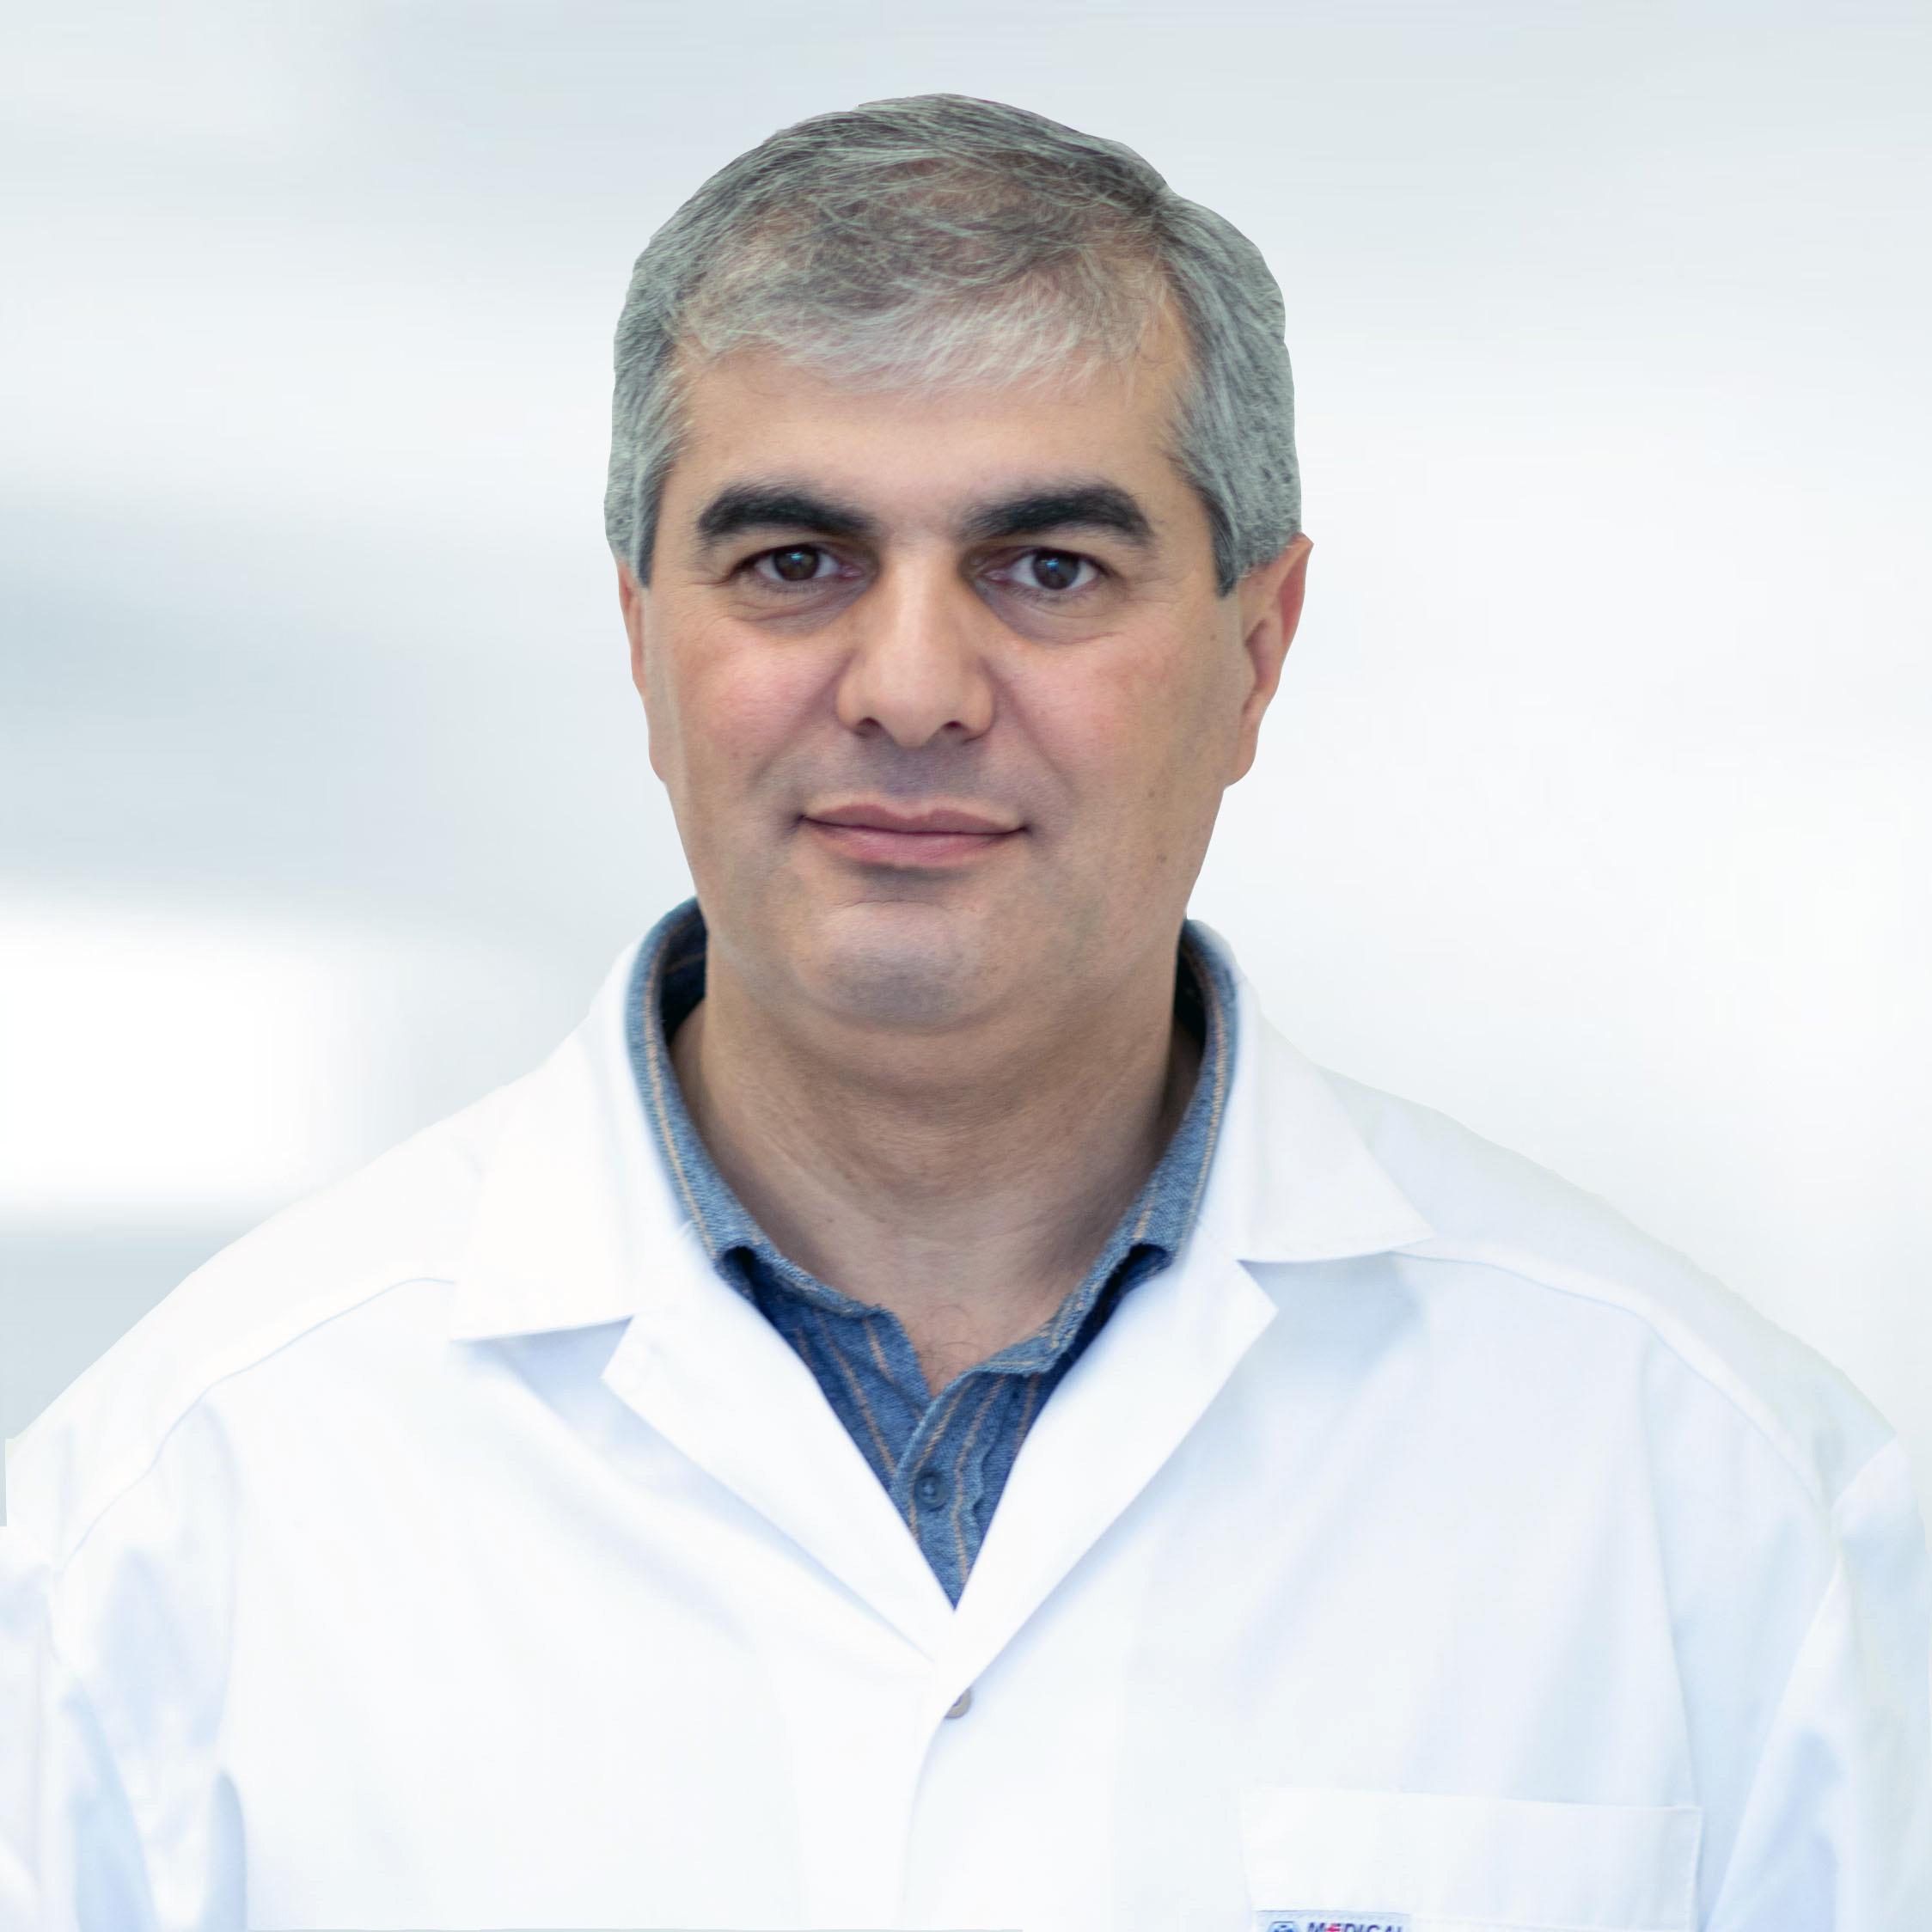 Алиев Тегеран БахлуловичВрач общей практики